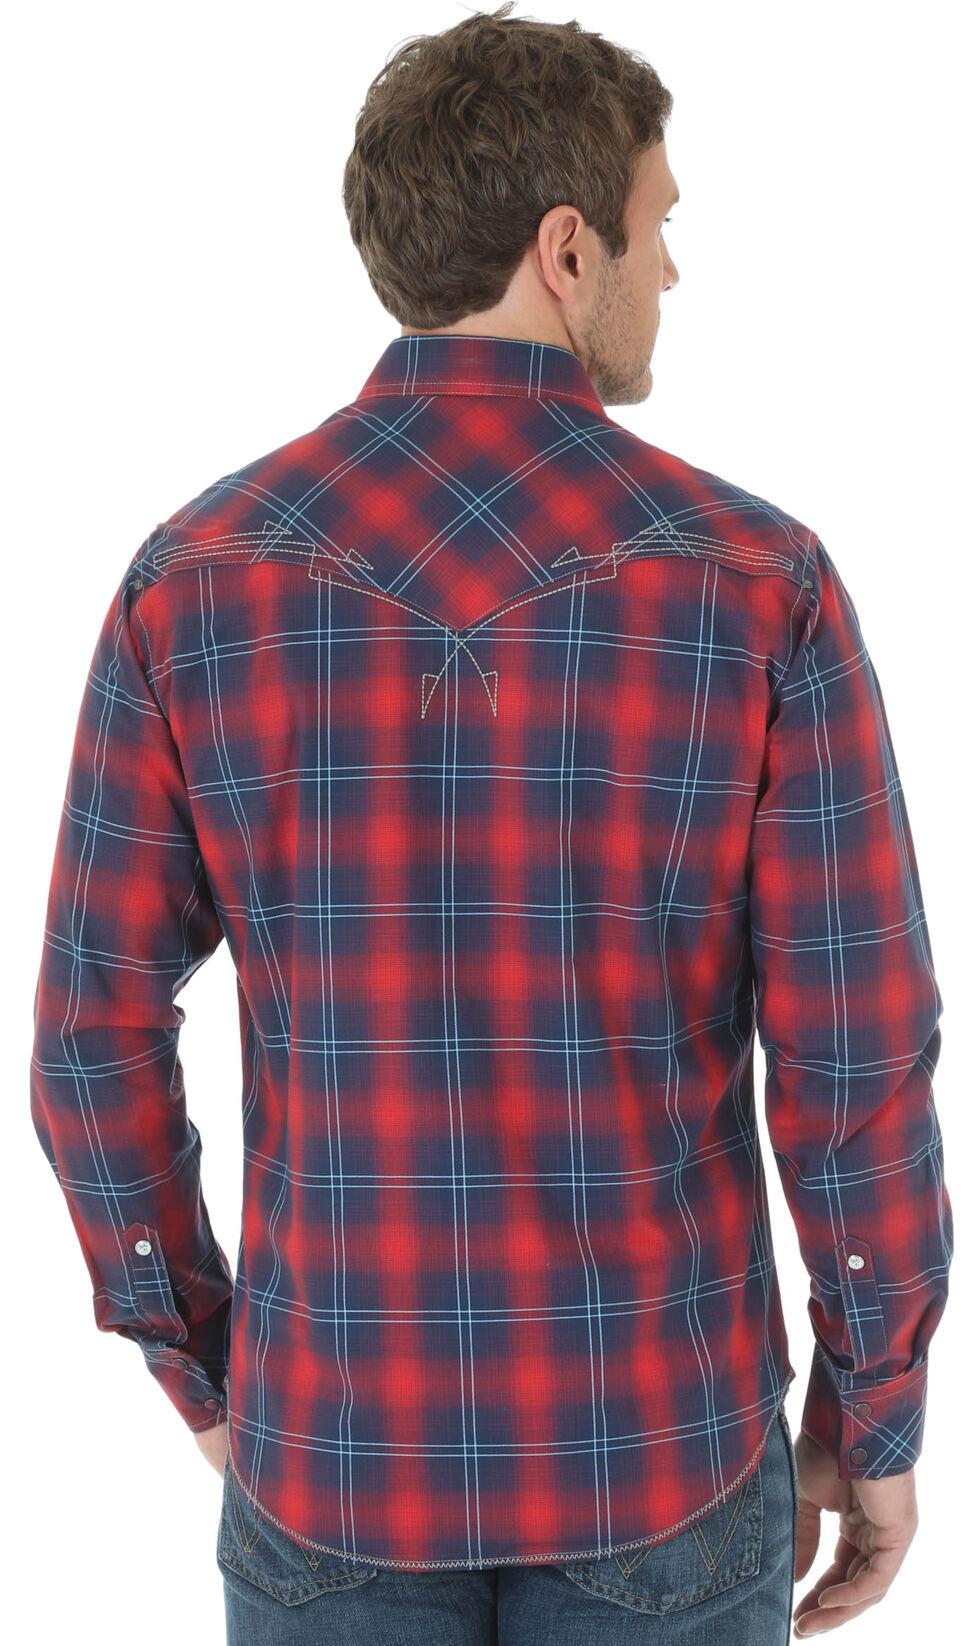 Wrangler Rock 47 Men's Red & Navy Plaid Western Long Sleeve Shirt , Red, hi-res